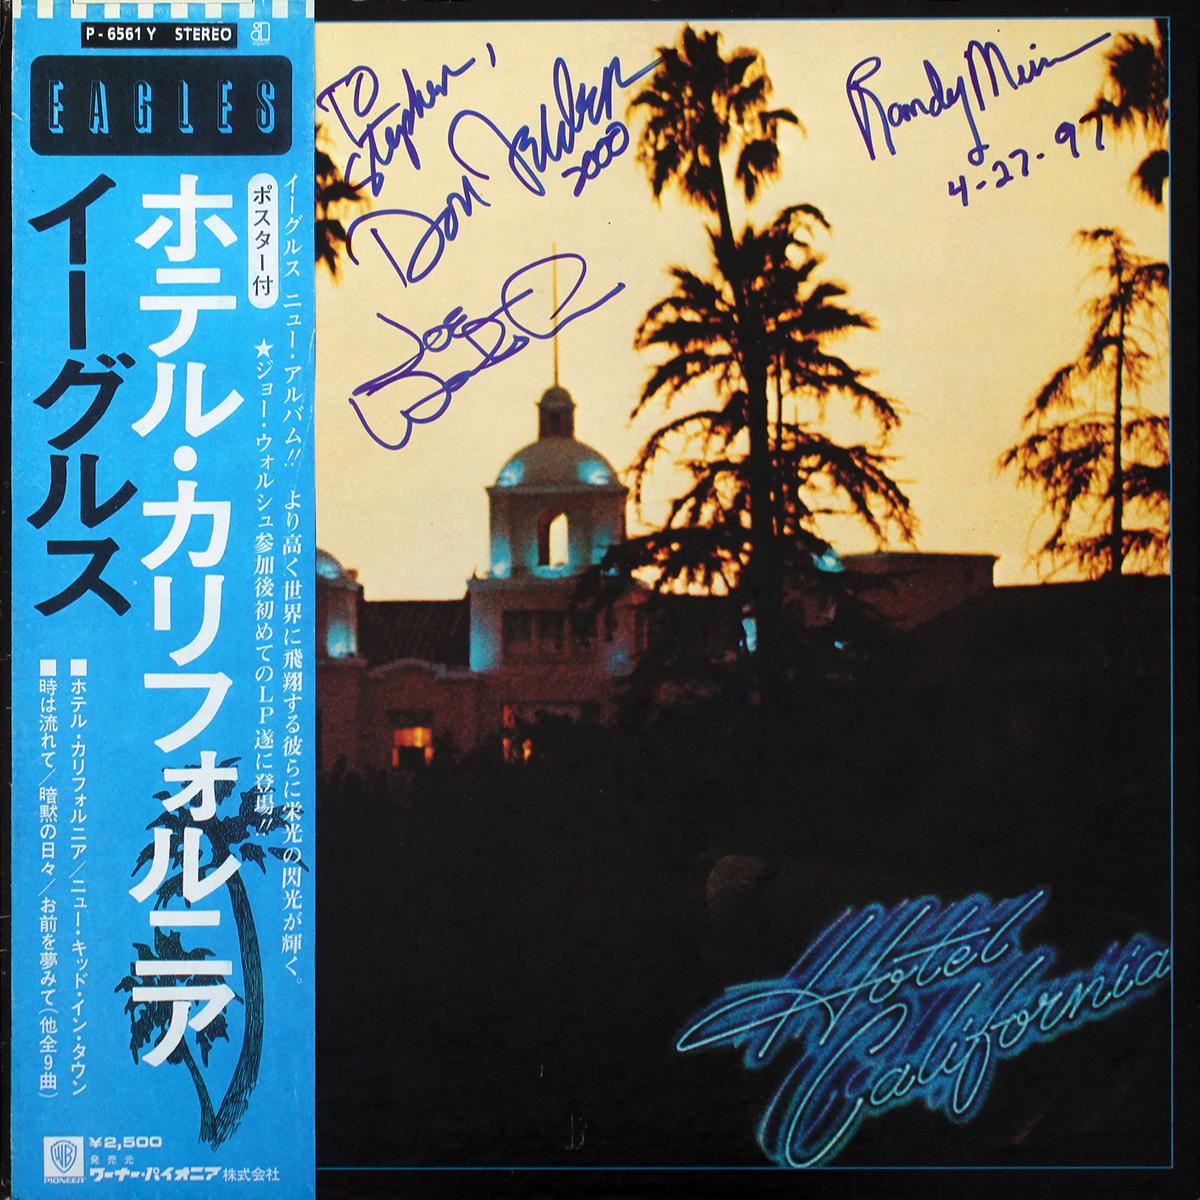 Eagles Hotel California LP (Japanese Import)